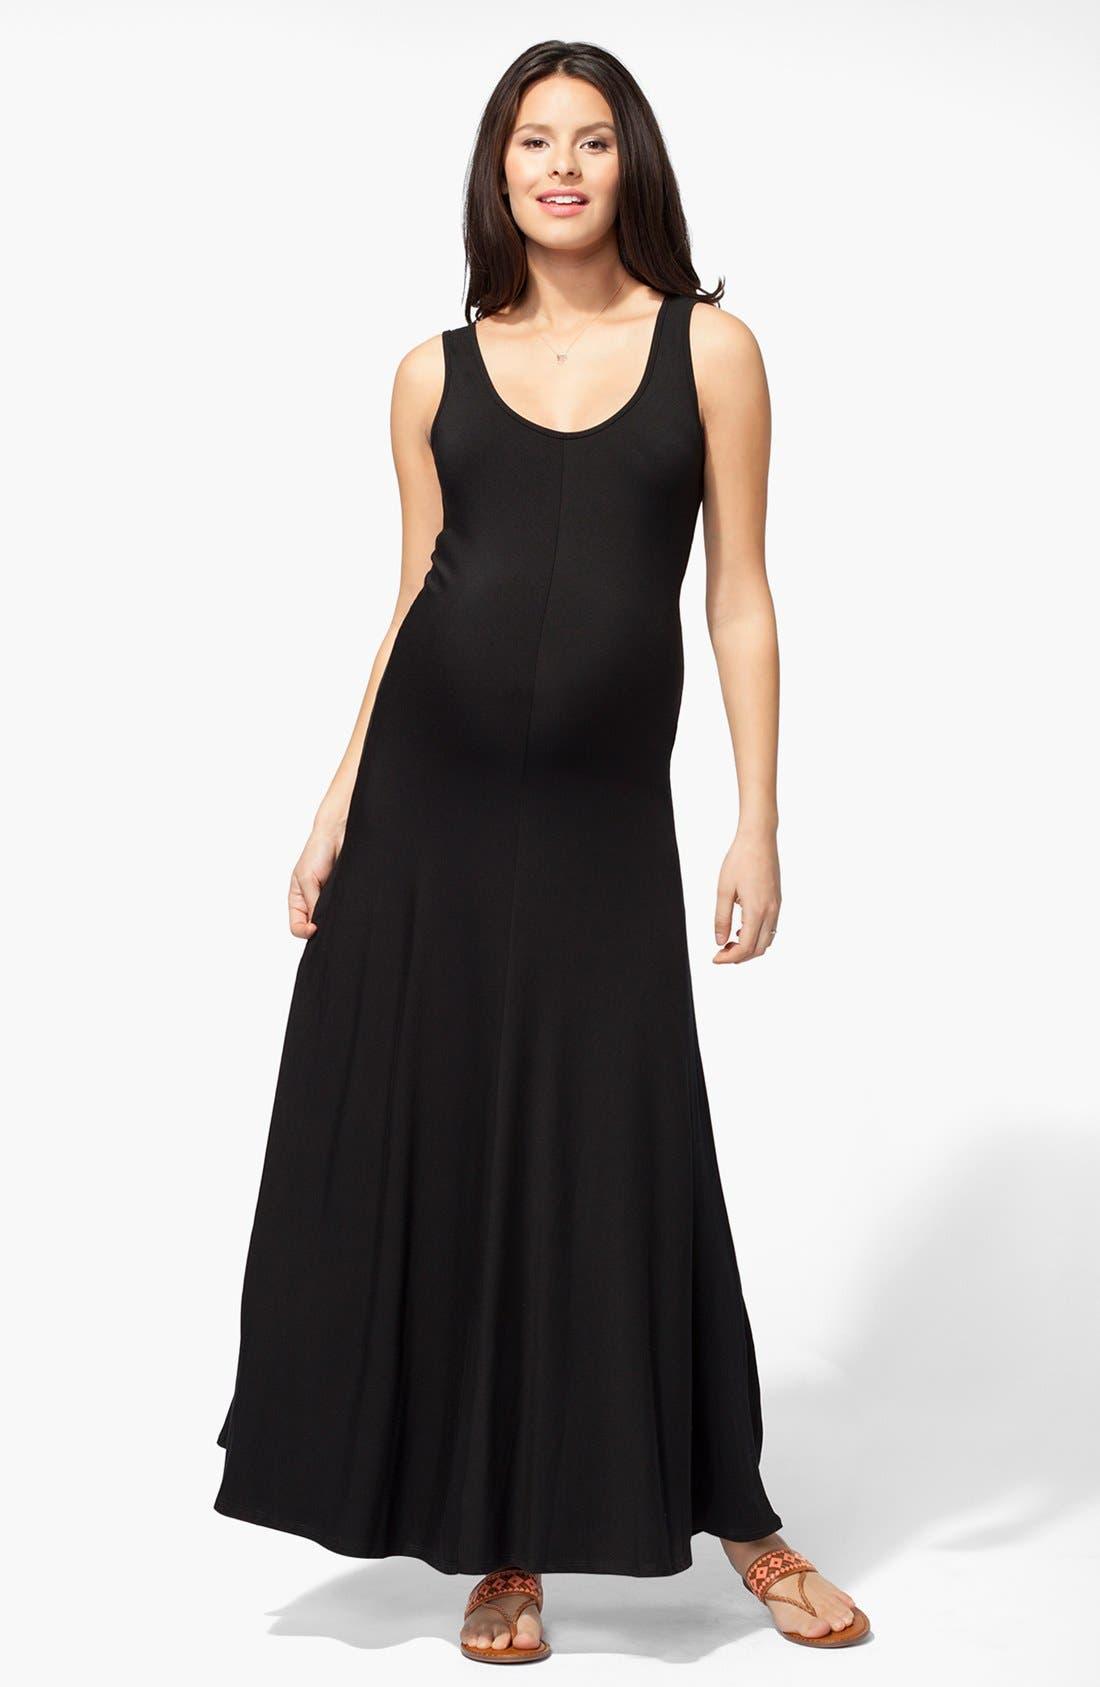 Alternate Image 1 Selected - Ingrid & Isabel® Tank Maternity Maxi Dress